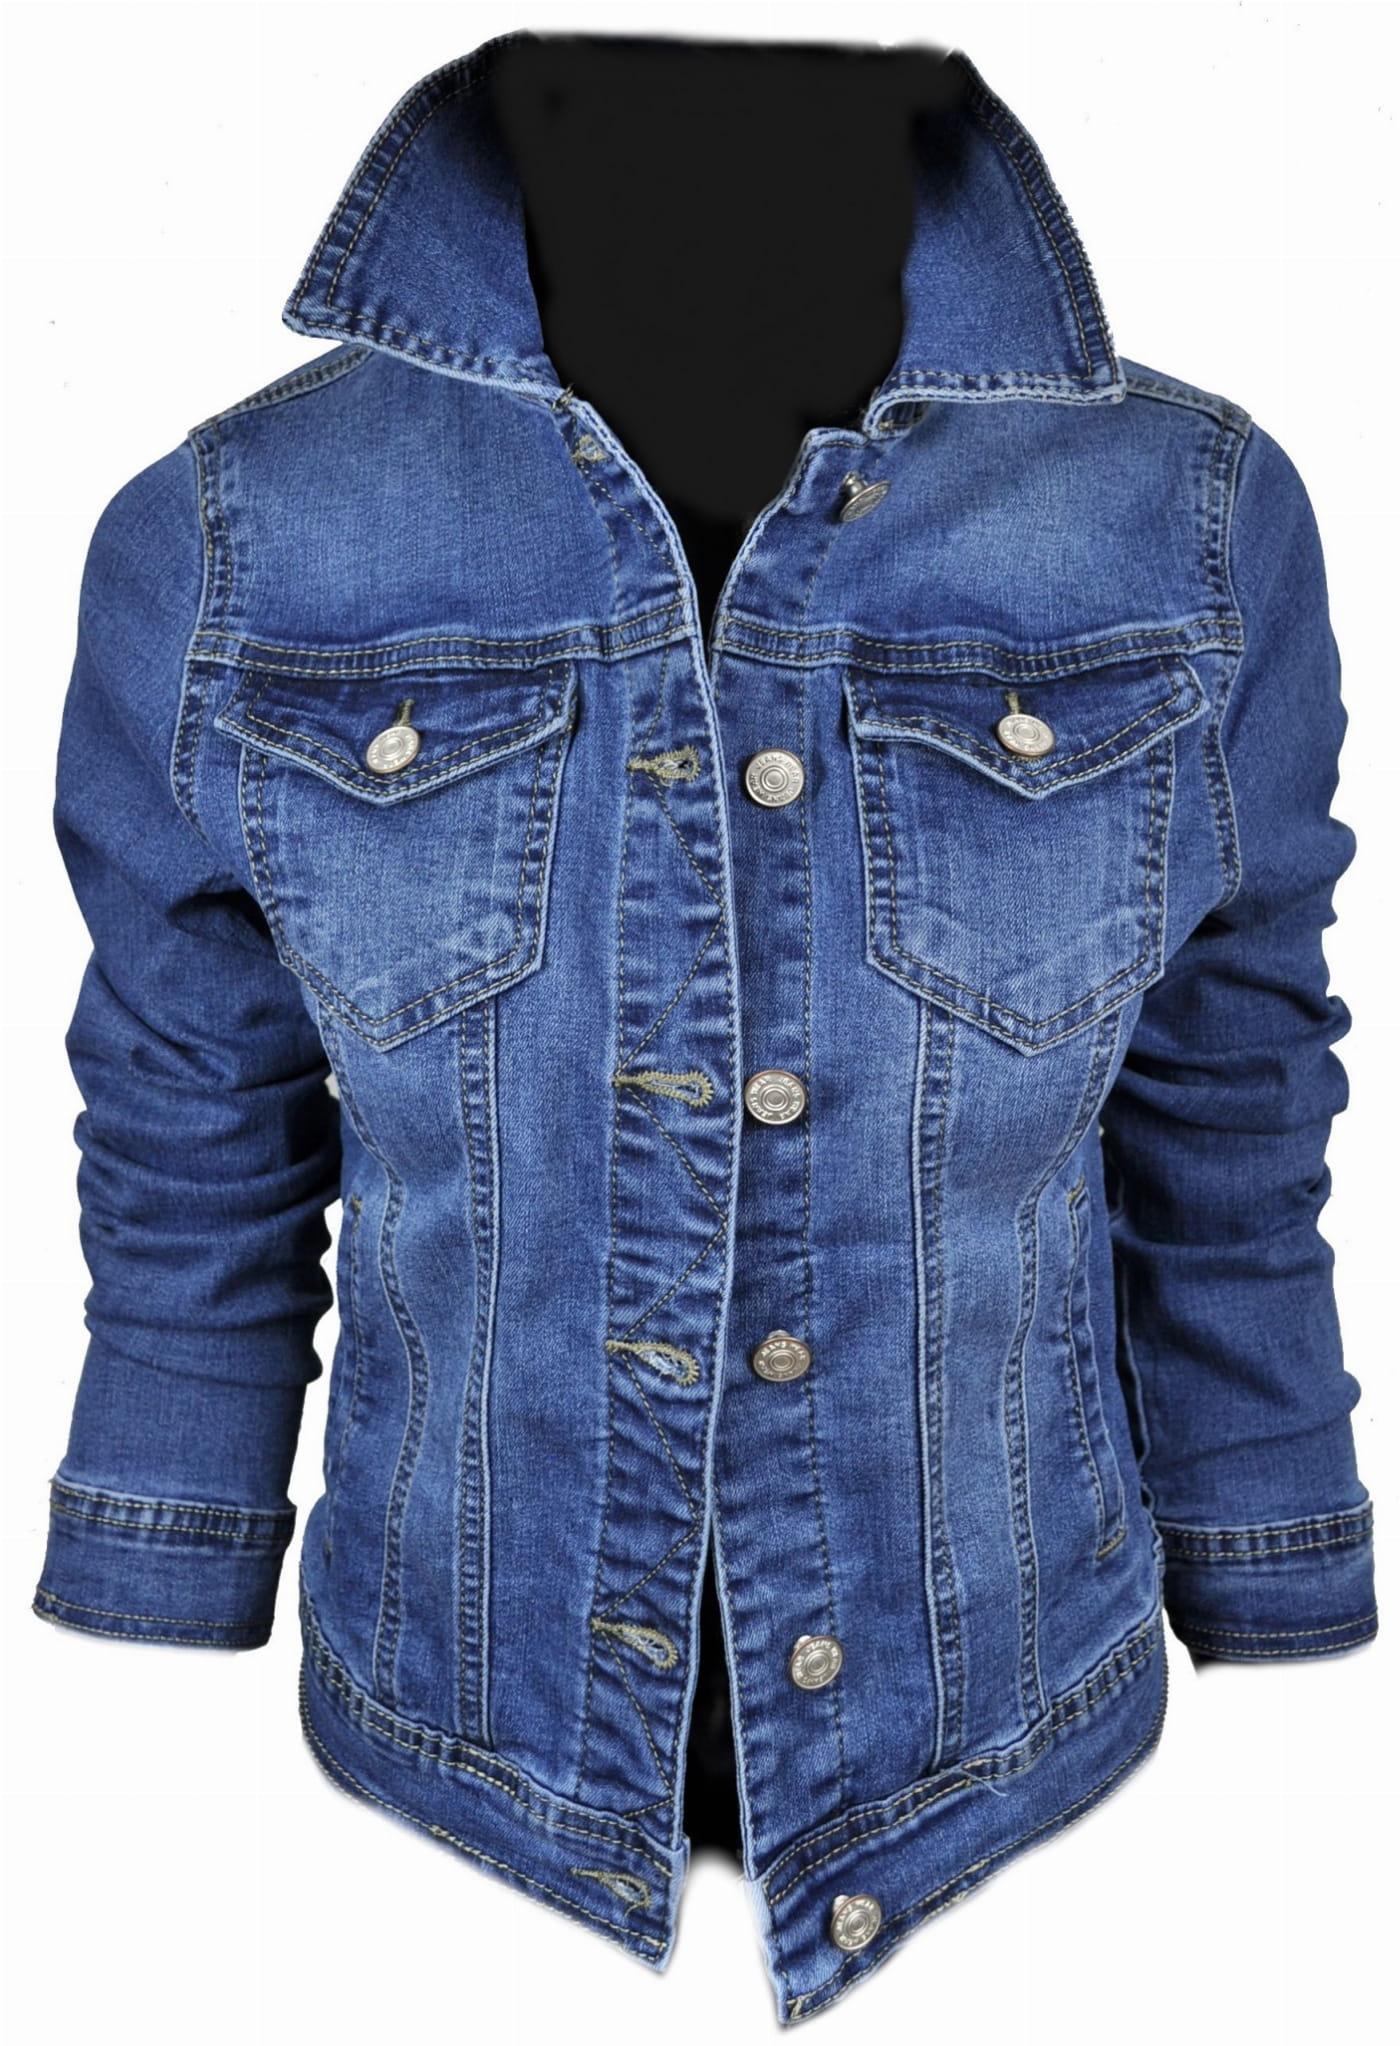 Wiosenna jeansowa damska kurtka jeans katana - 209